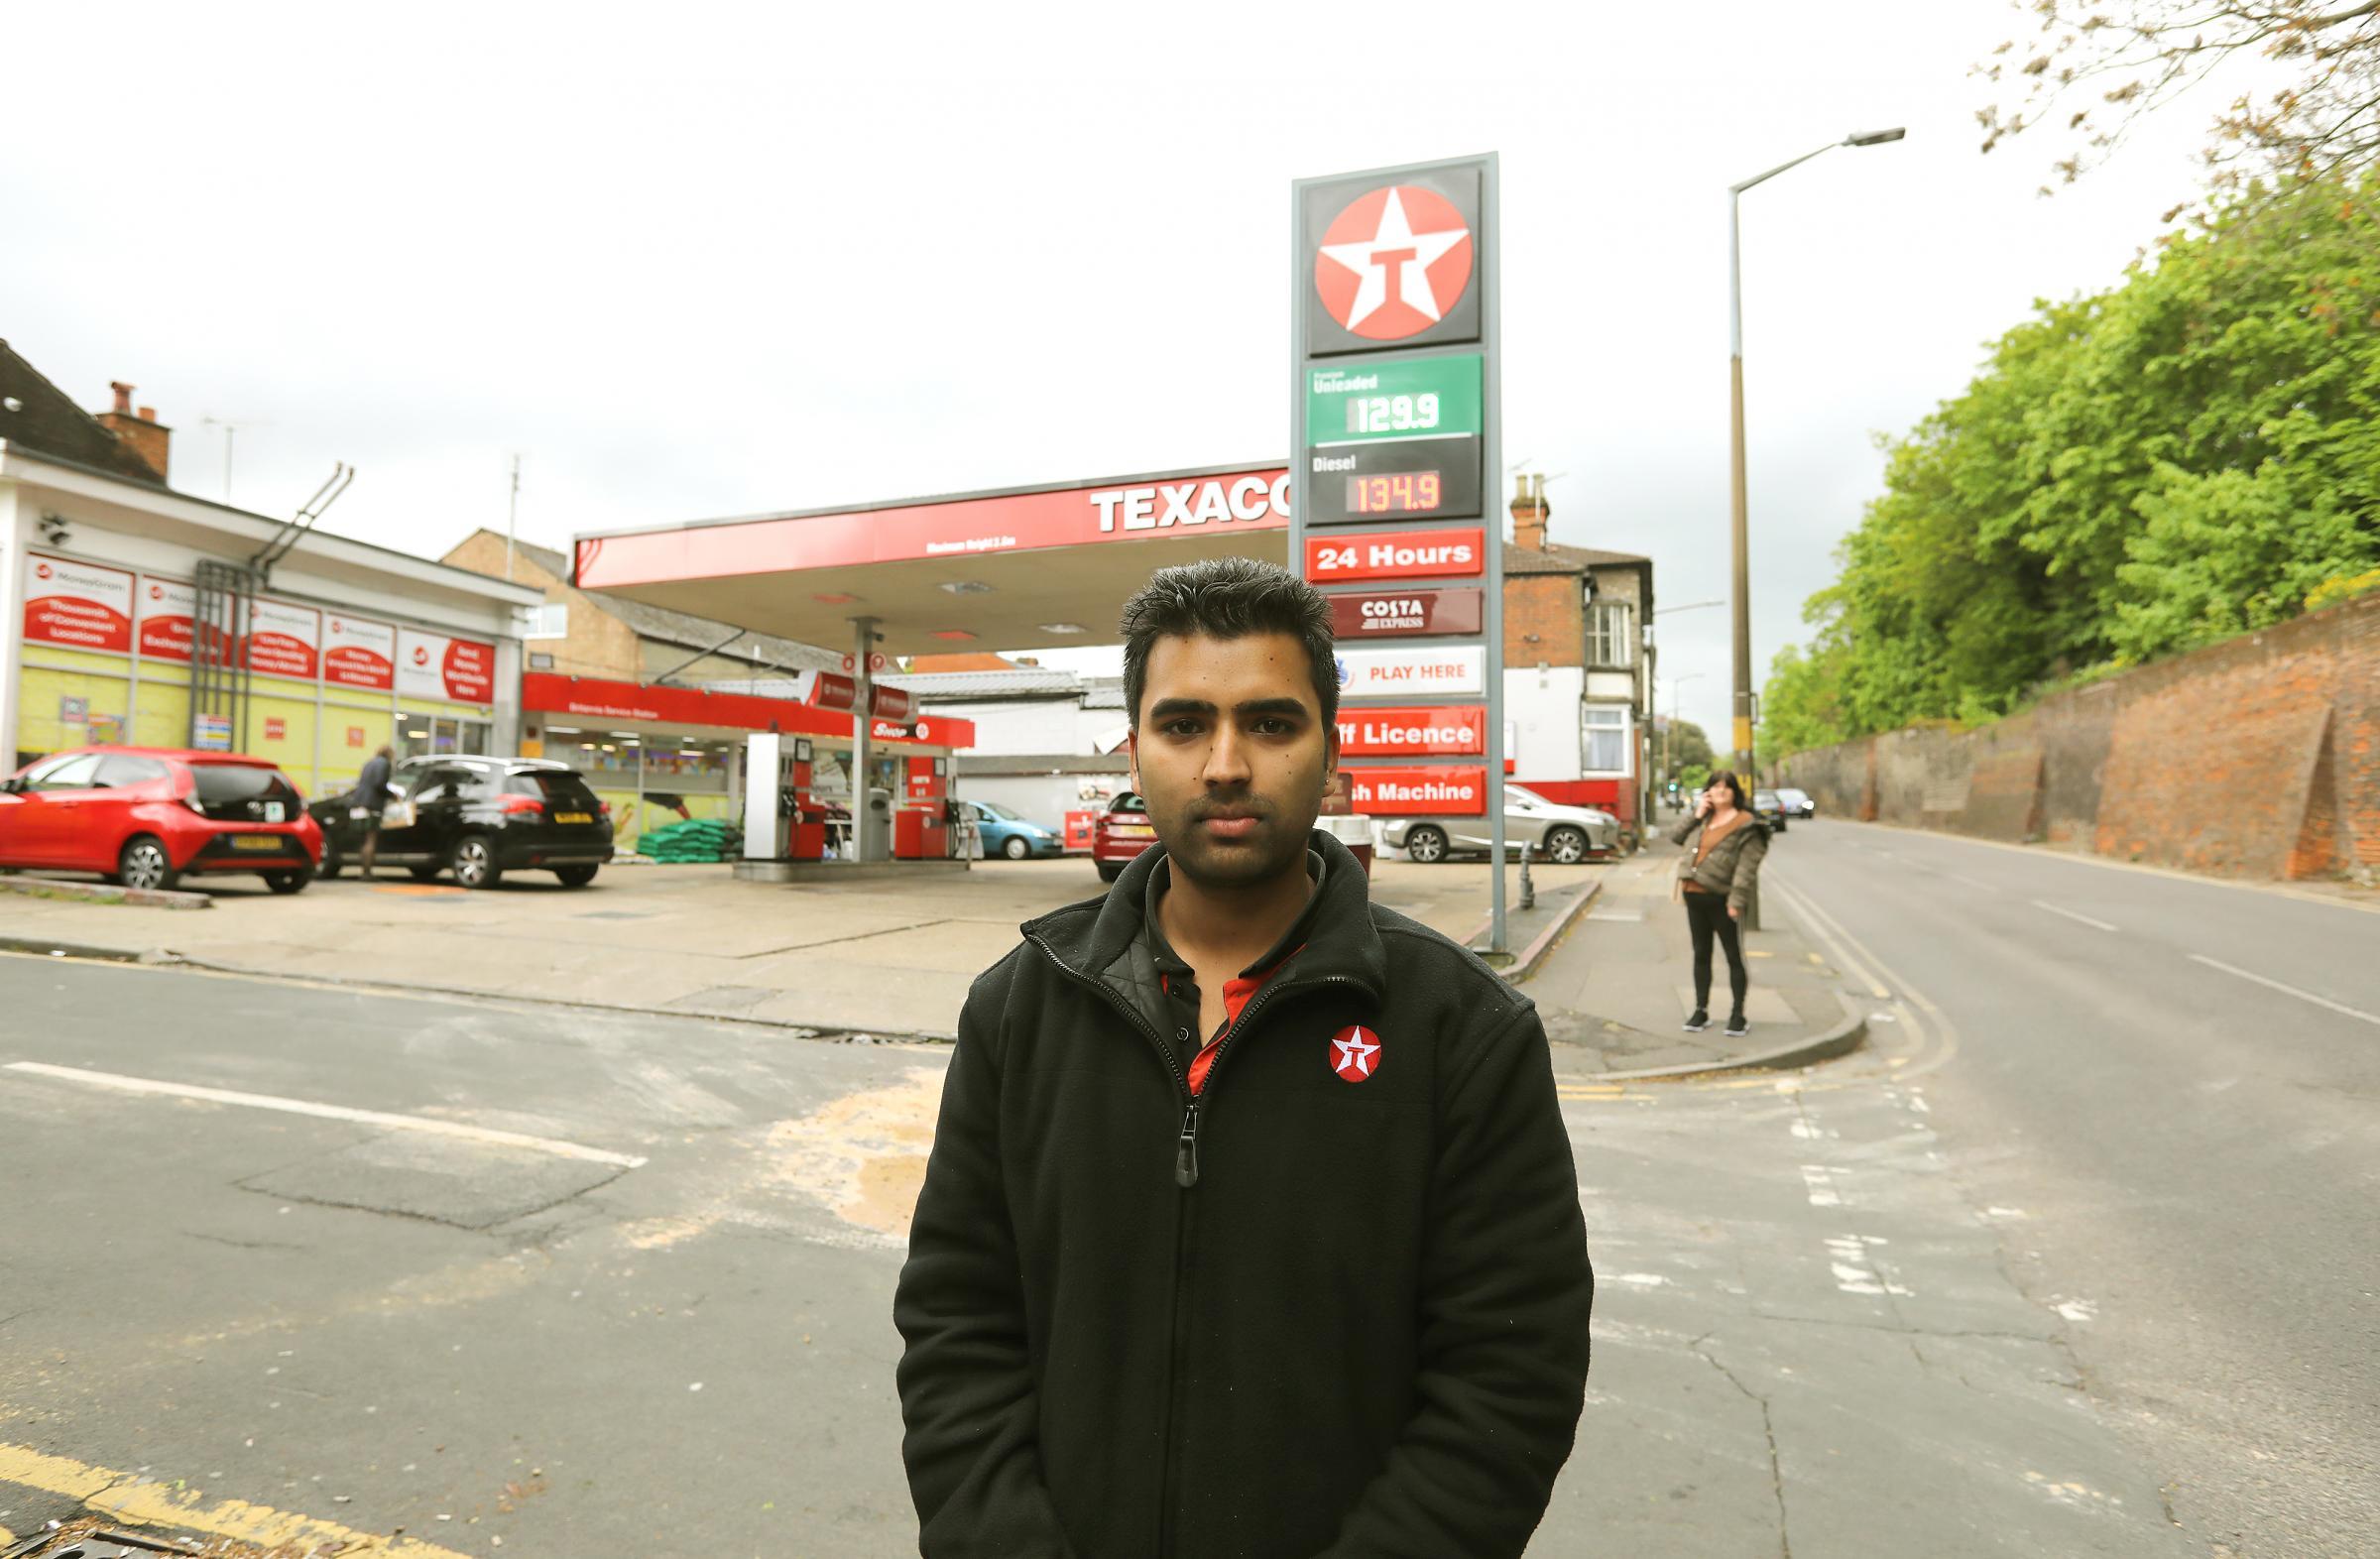 Heroes save man in petrol station drama in Mersea Road | Gazette